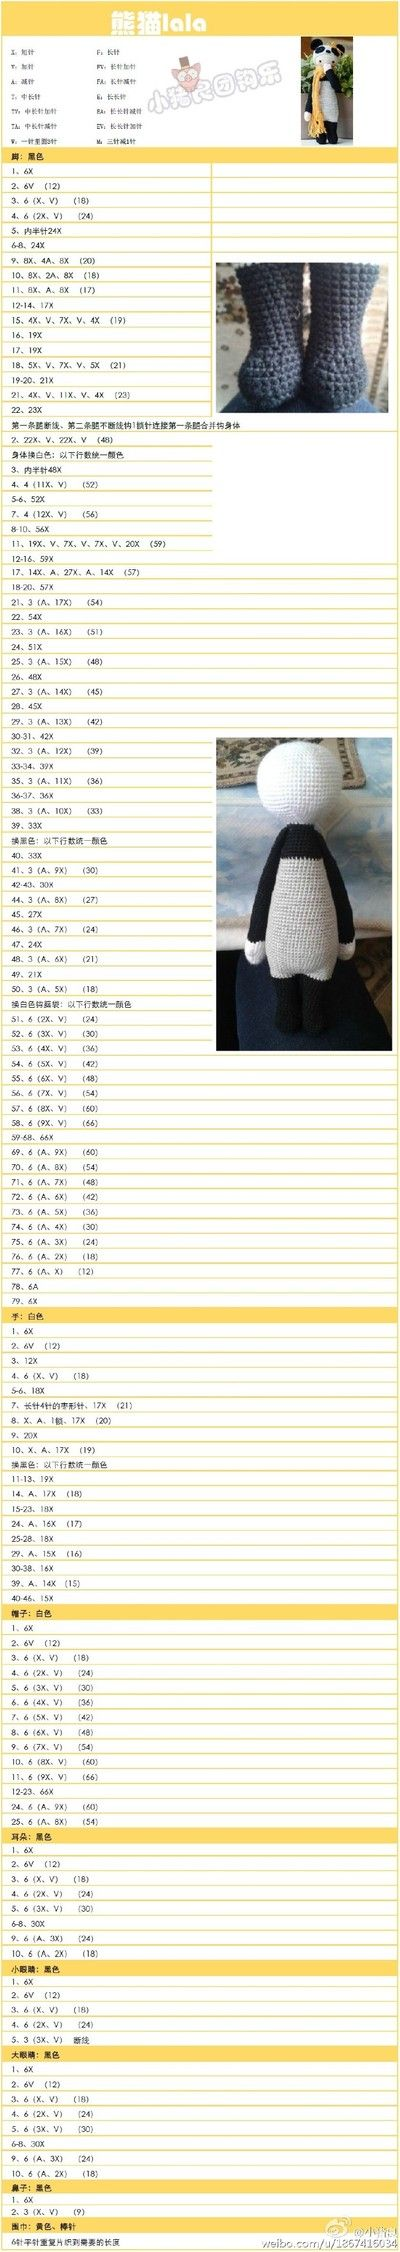 Mejores 419 imágenes de Amigurumi en Pinterest | Juguetes de ...